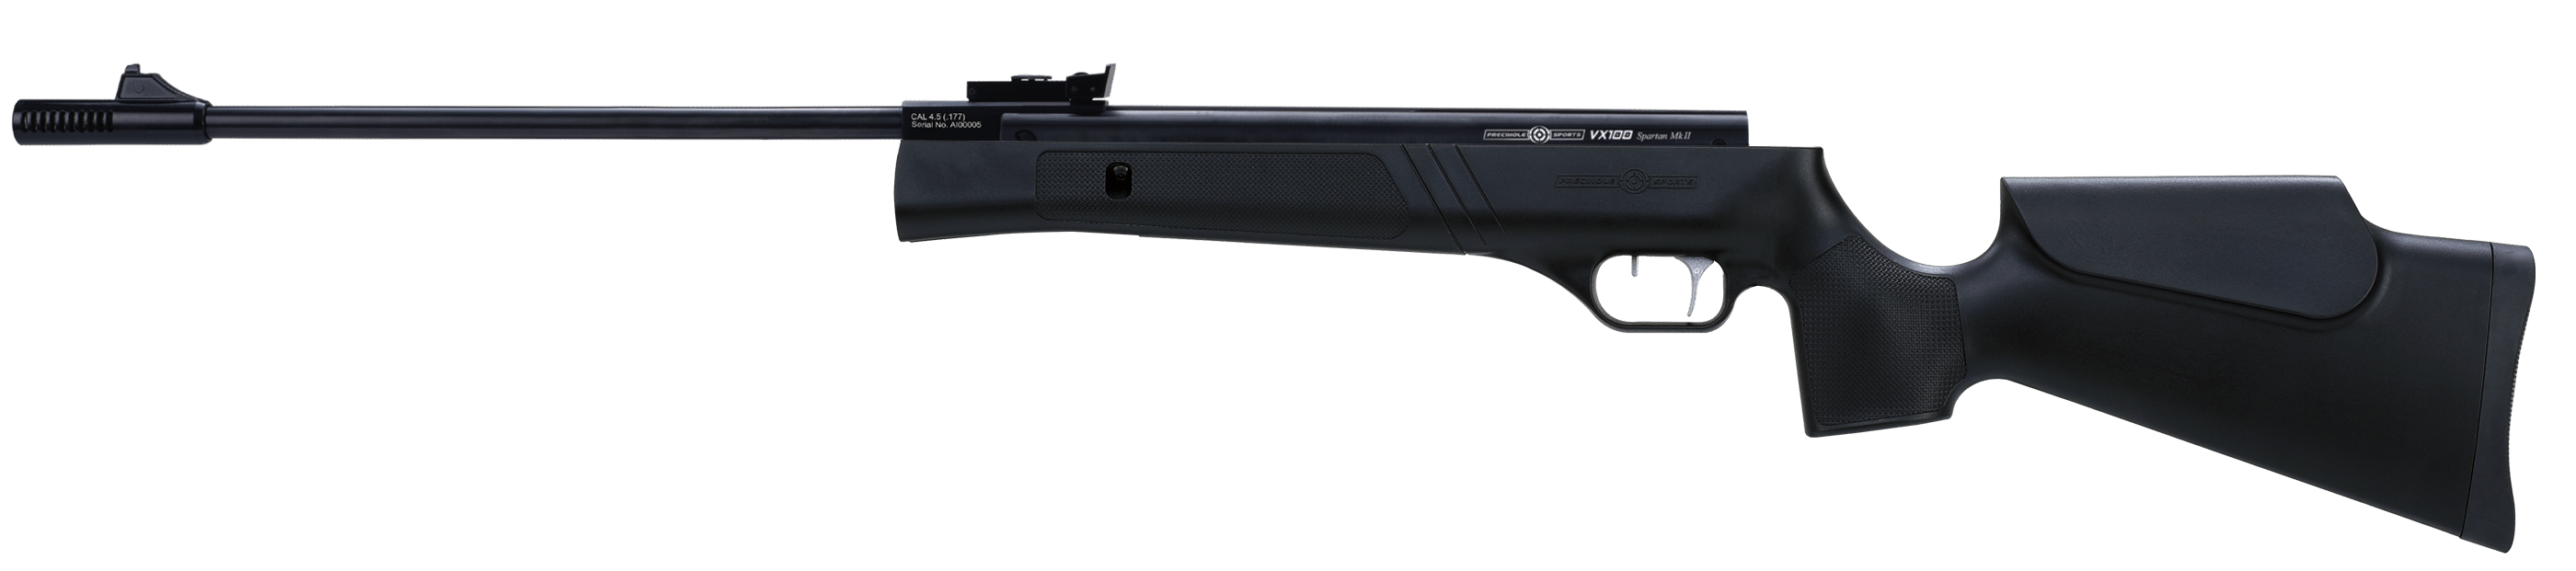 VX100 Spartan Mark 2 - Low Cost Performance Air Rifle